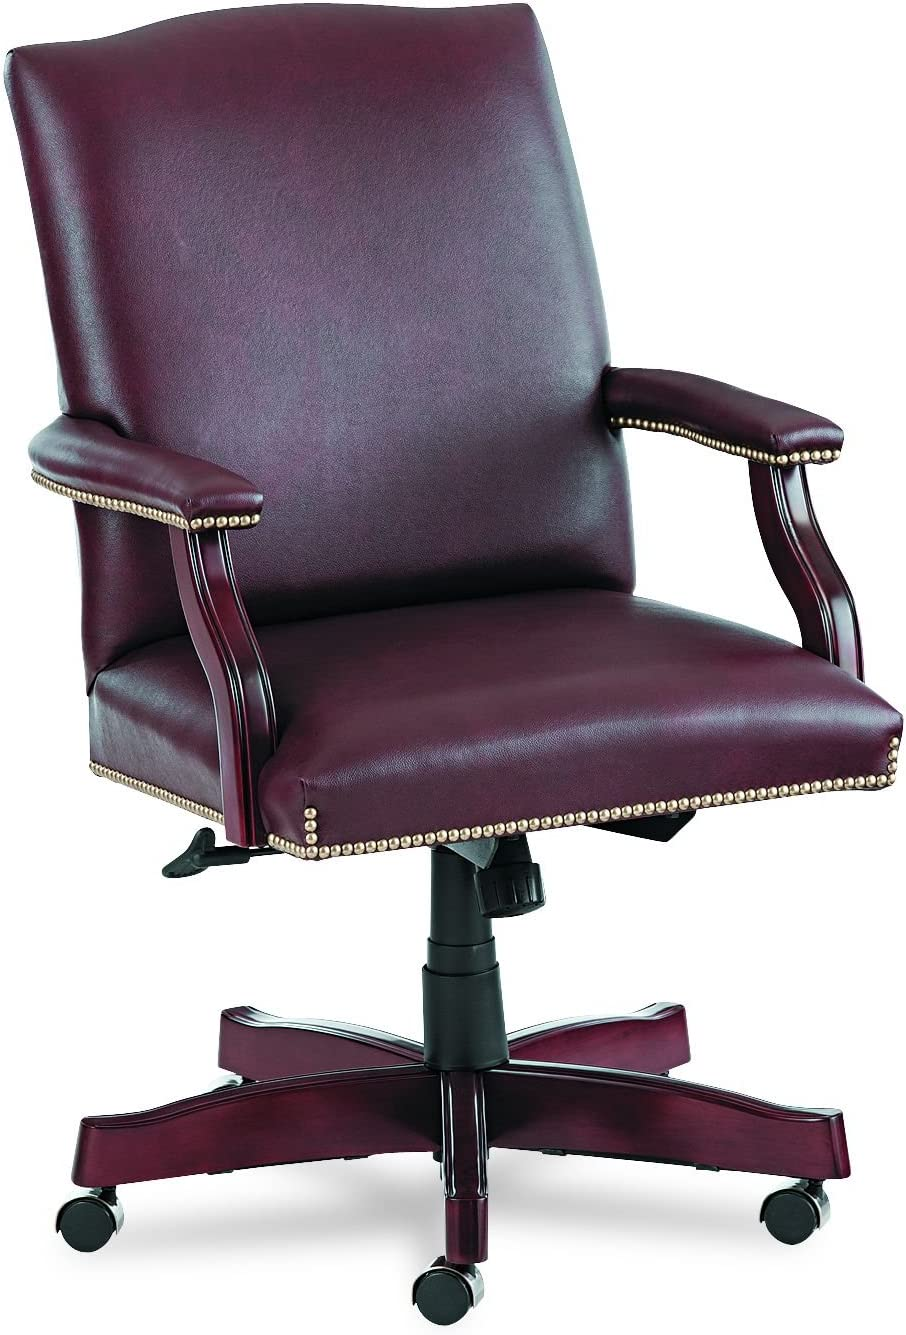 HON Jackson 6570 Series Executive High-Back Swivel and Tilt Chair, Burgundy Leather